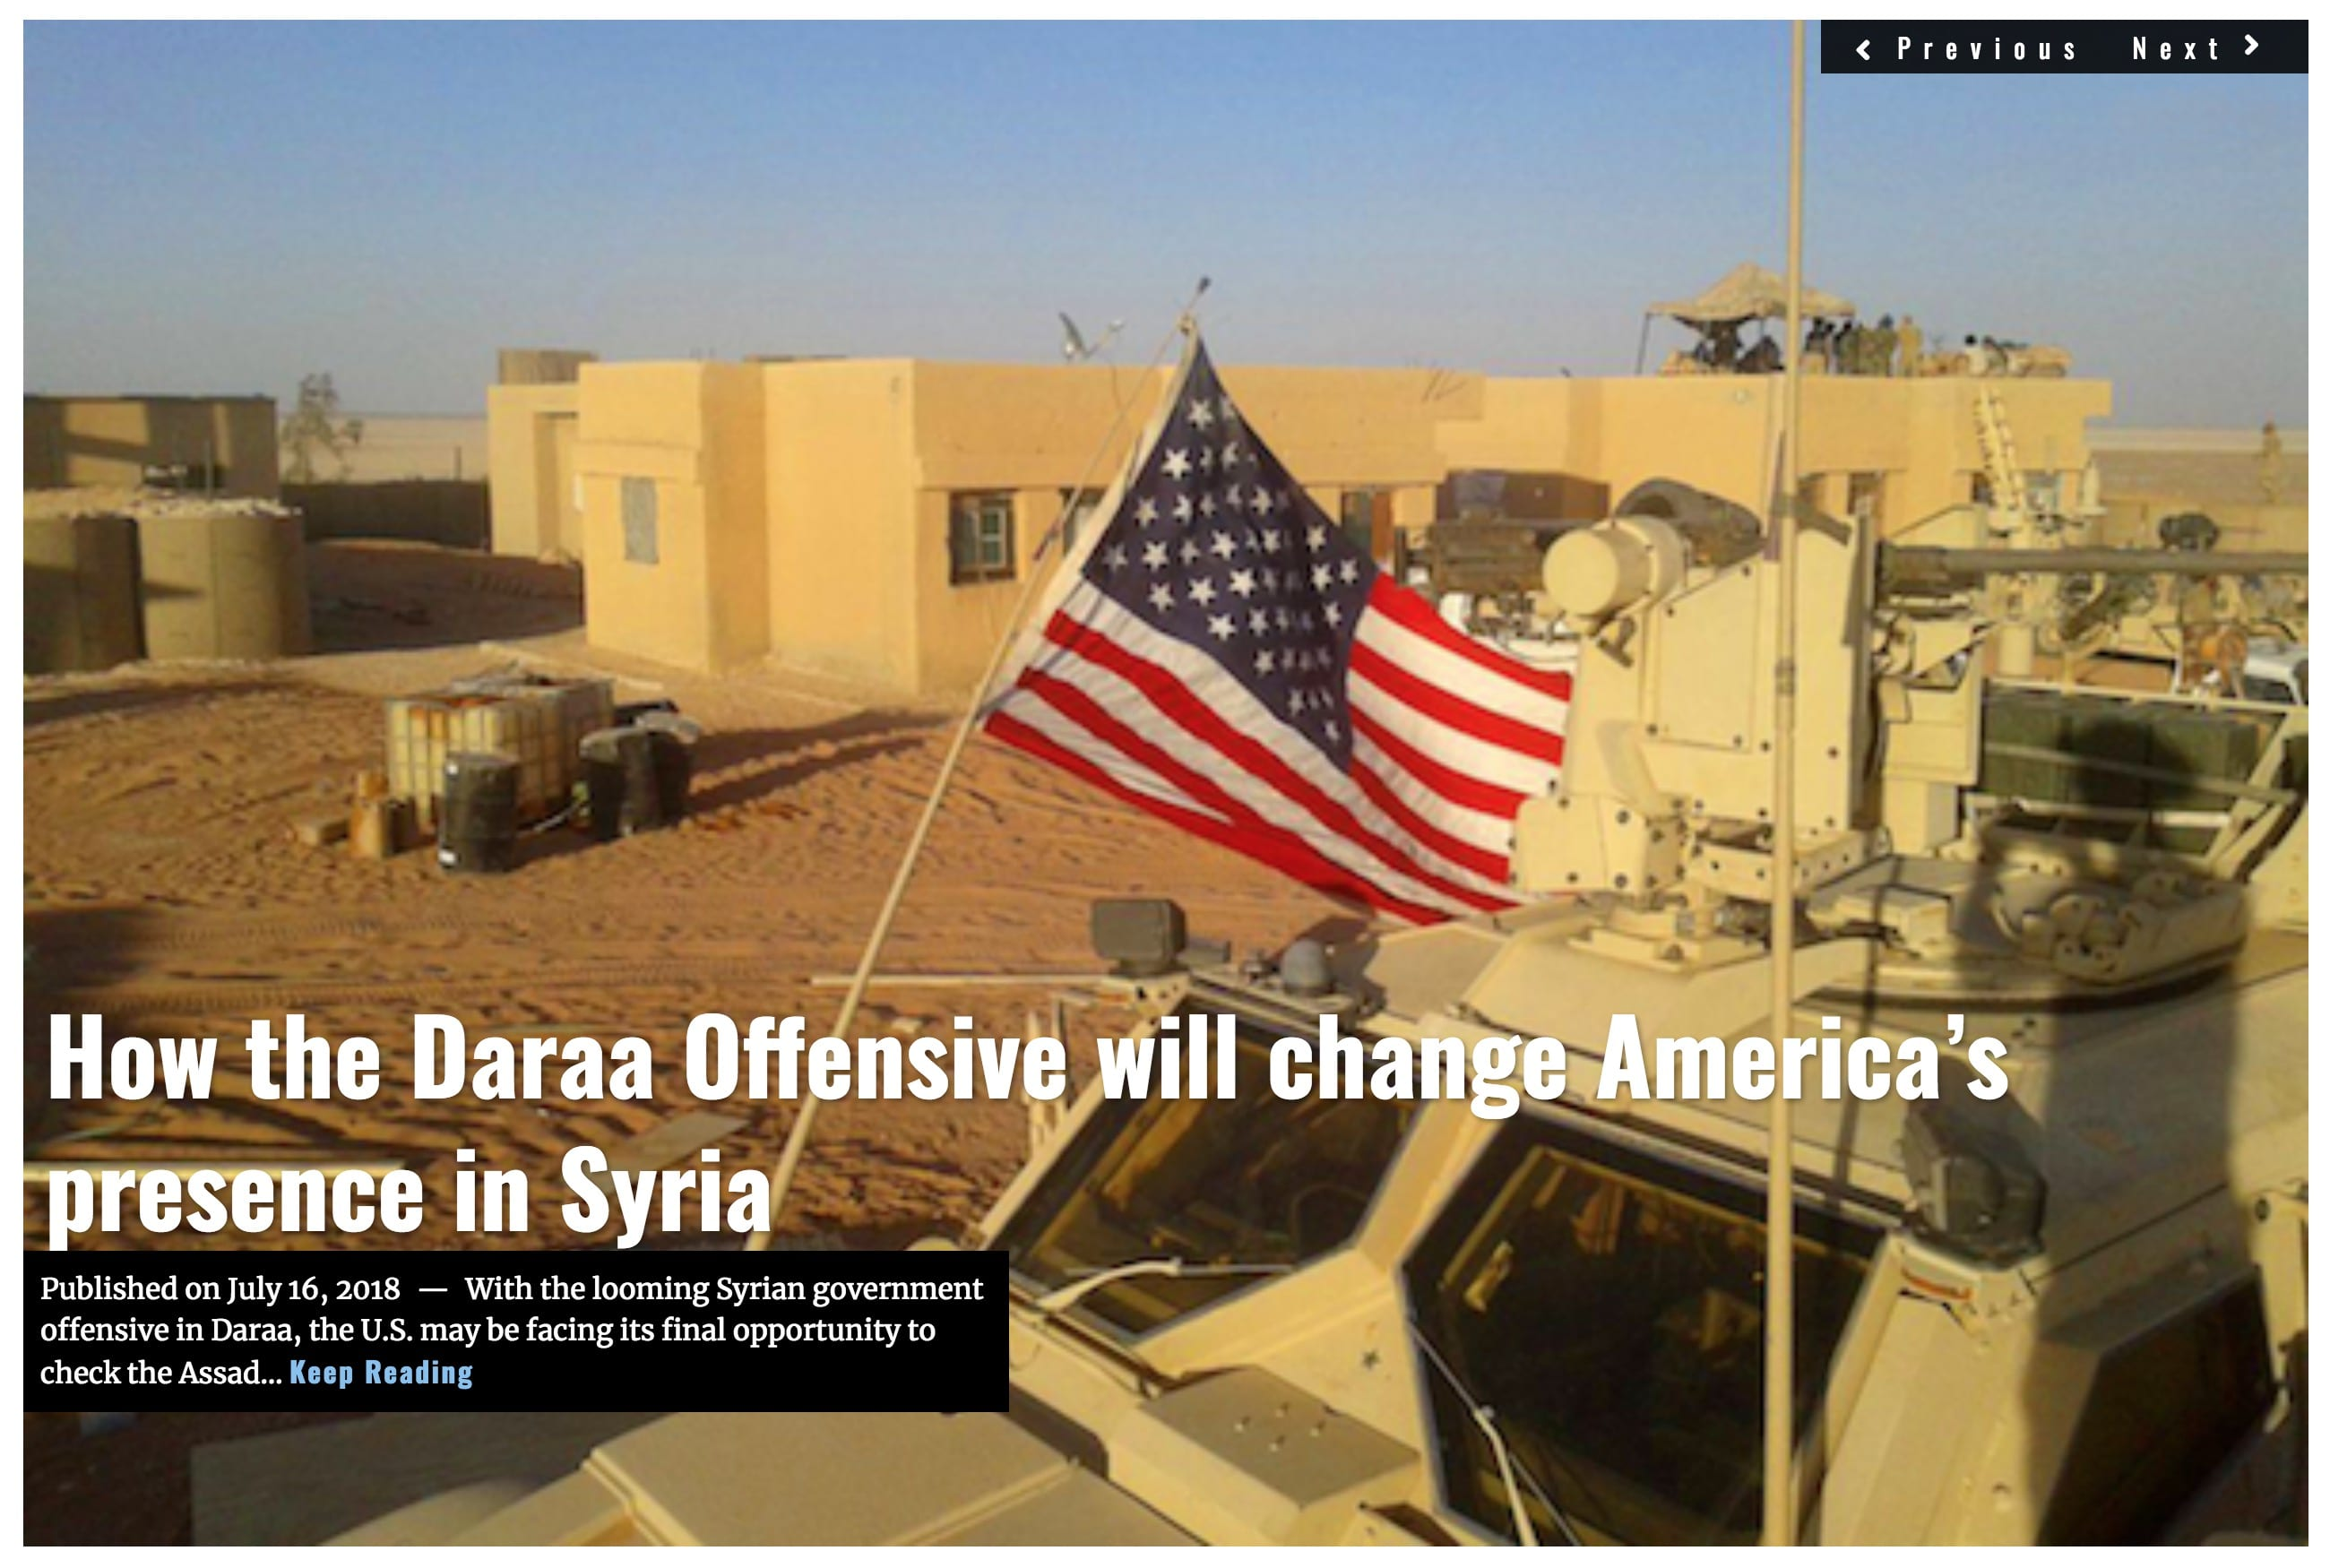 Image Lima Charlie News Headline Daraa Offensive Syria JUL 16 2018